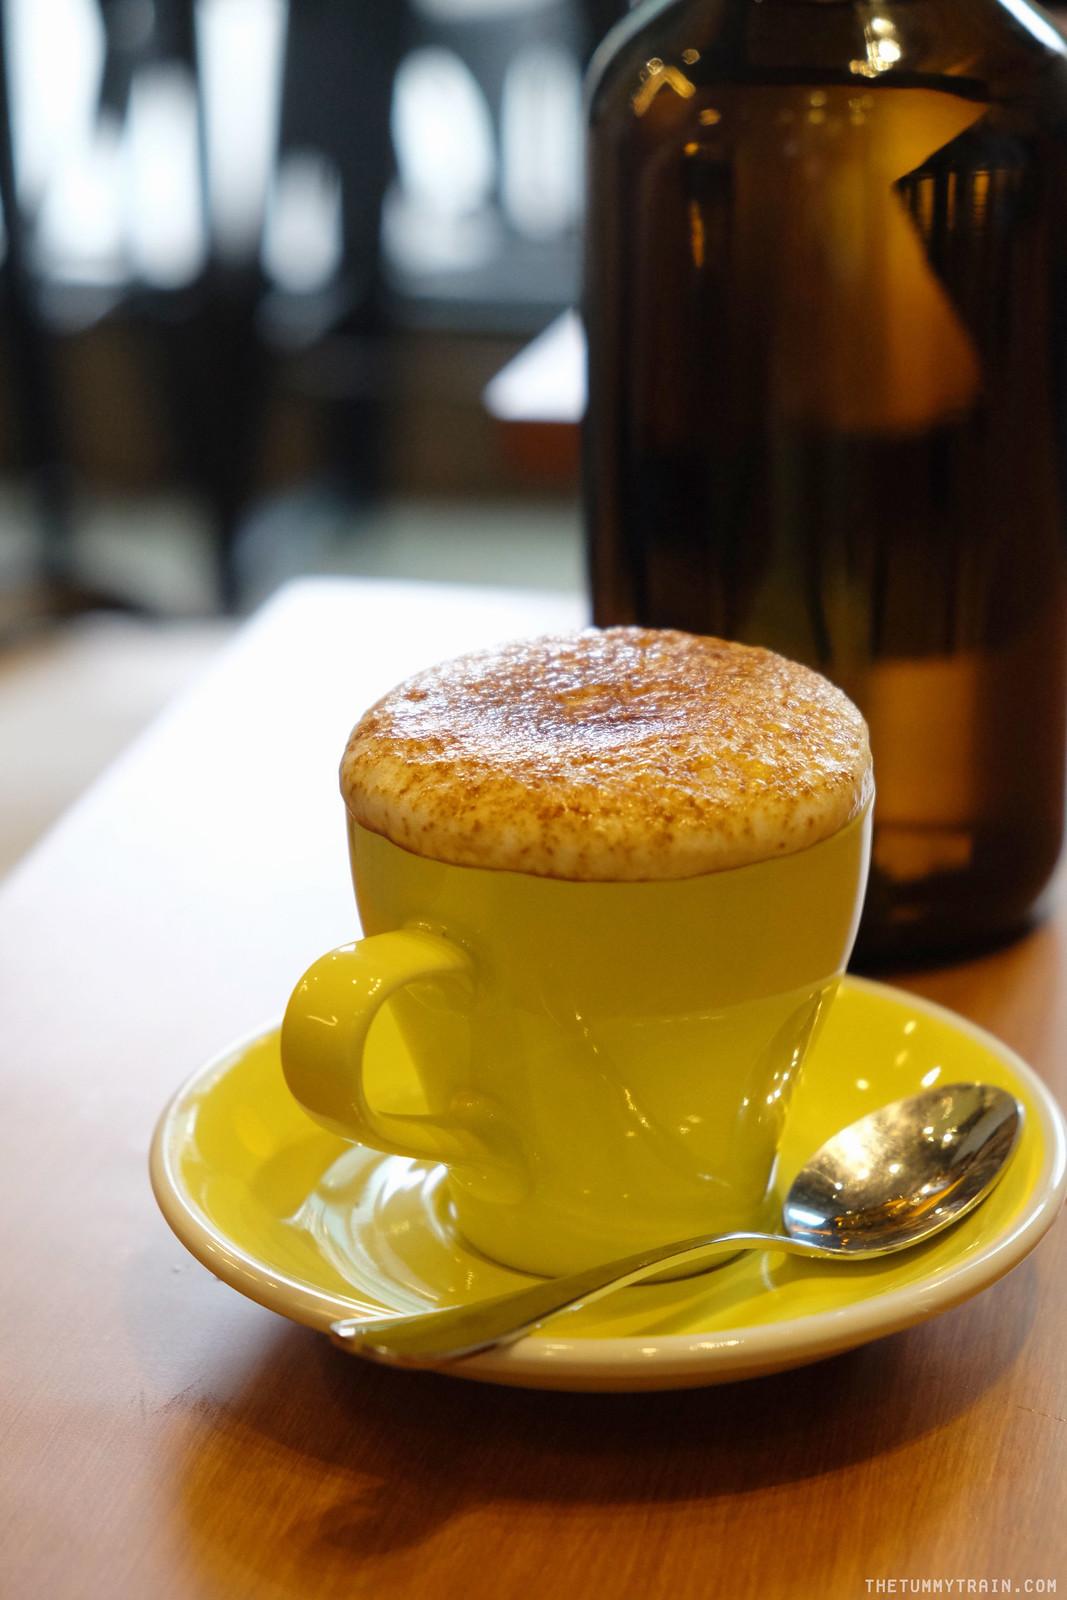 31111078205 d115b1396f h - A Fundamental Coffee break in Park Terraces Tower Makati